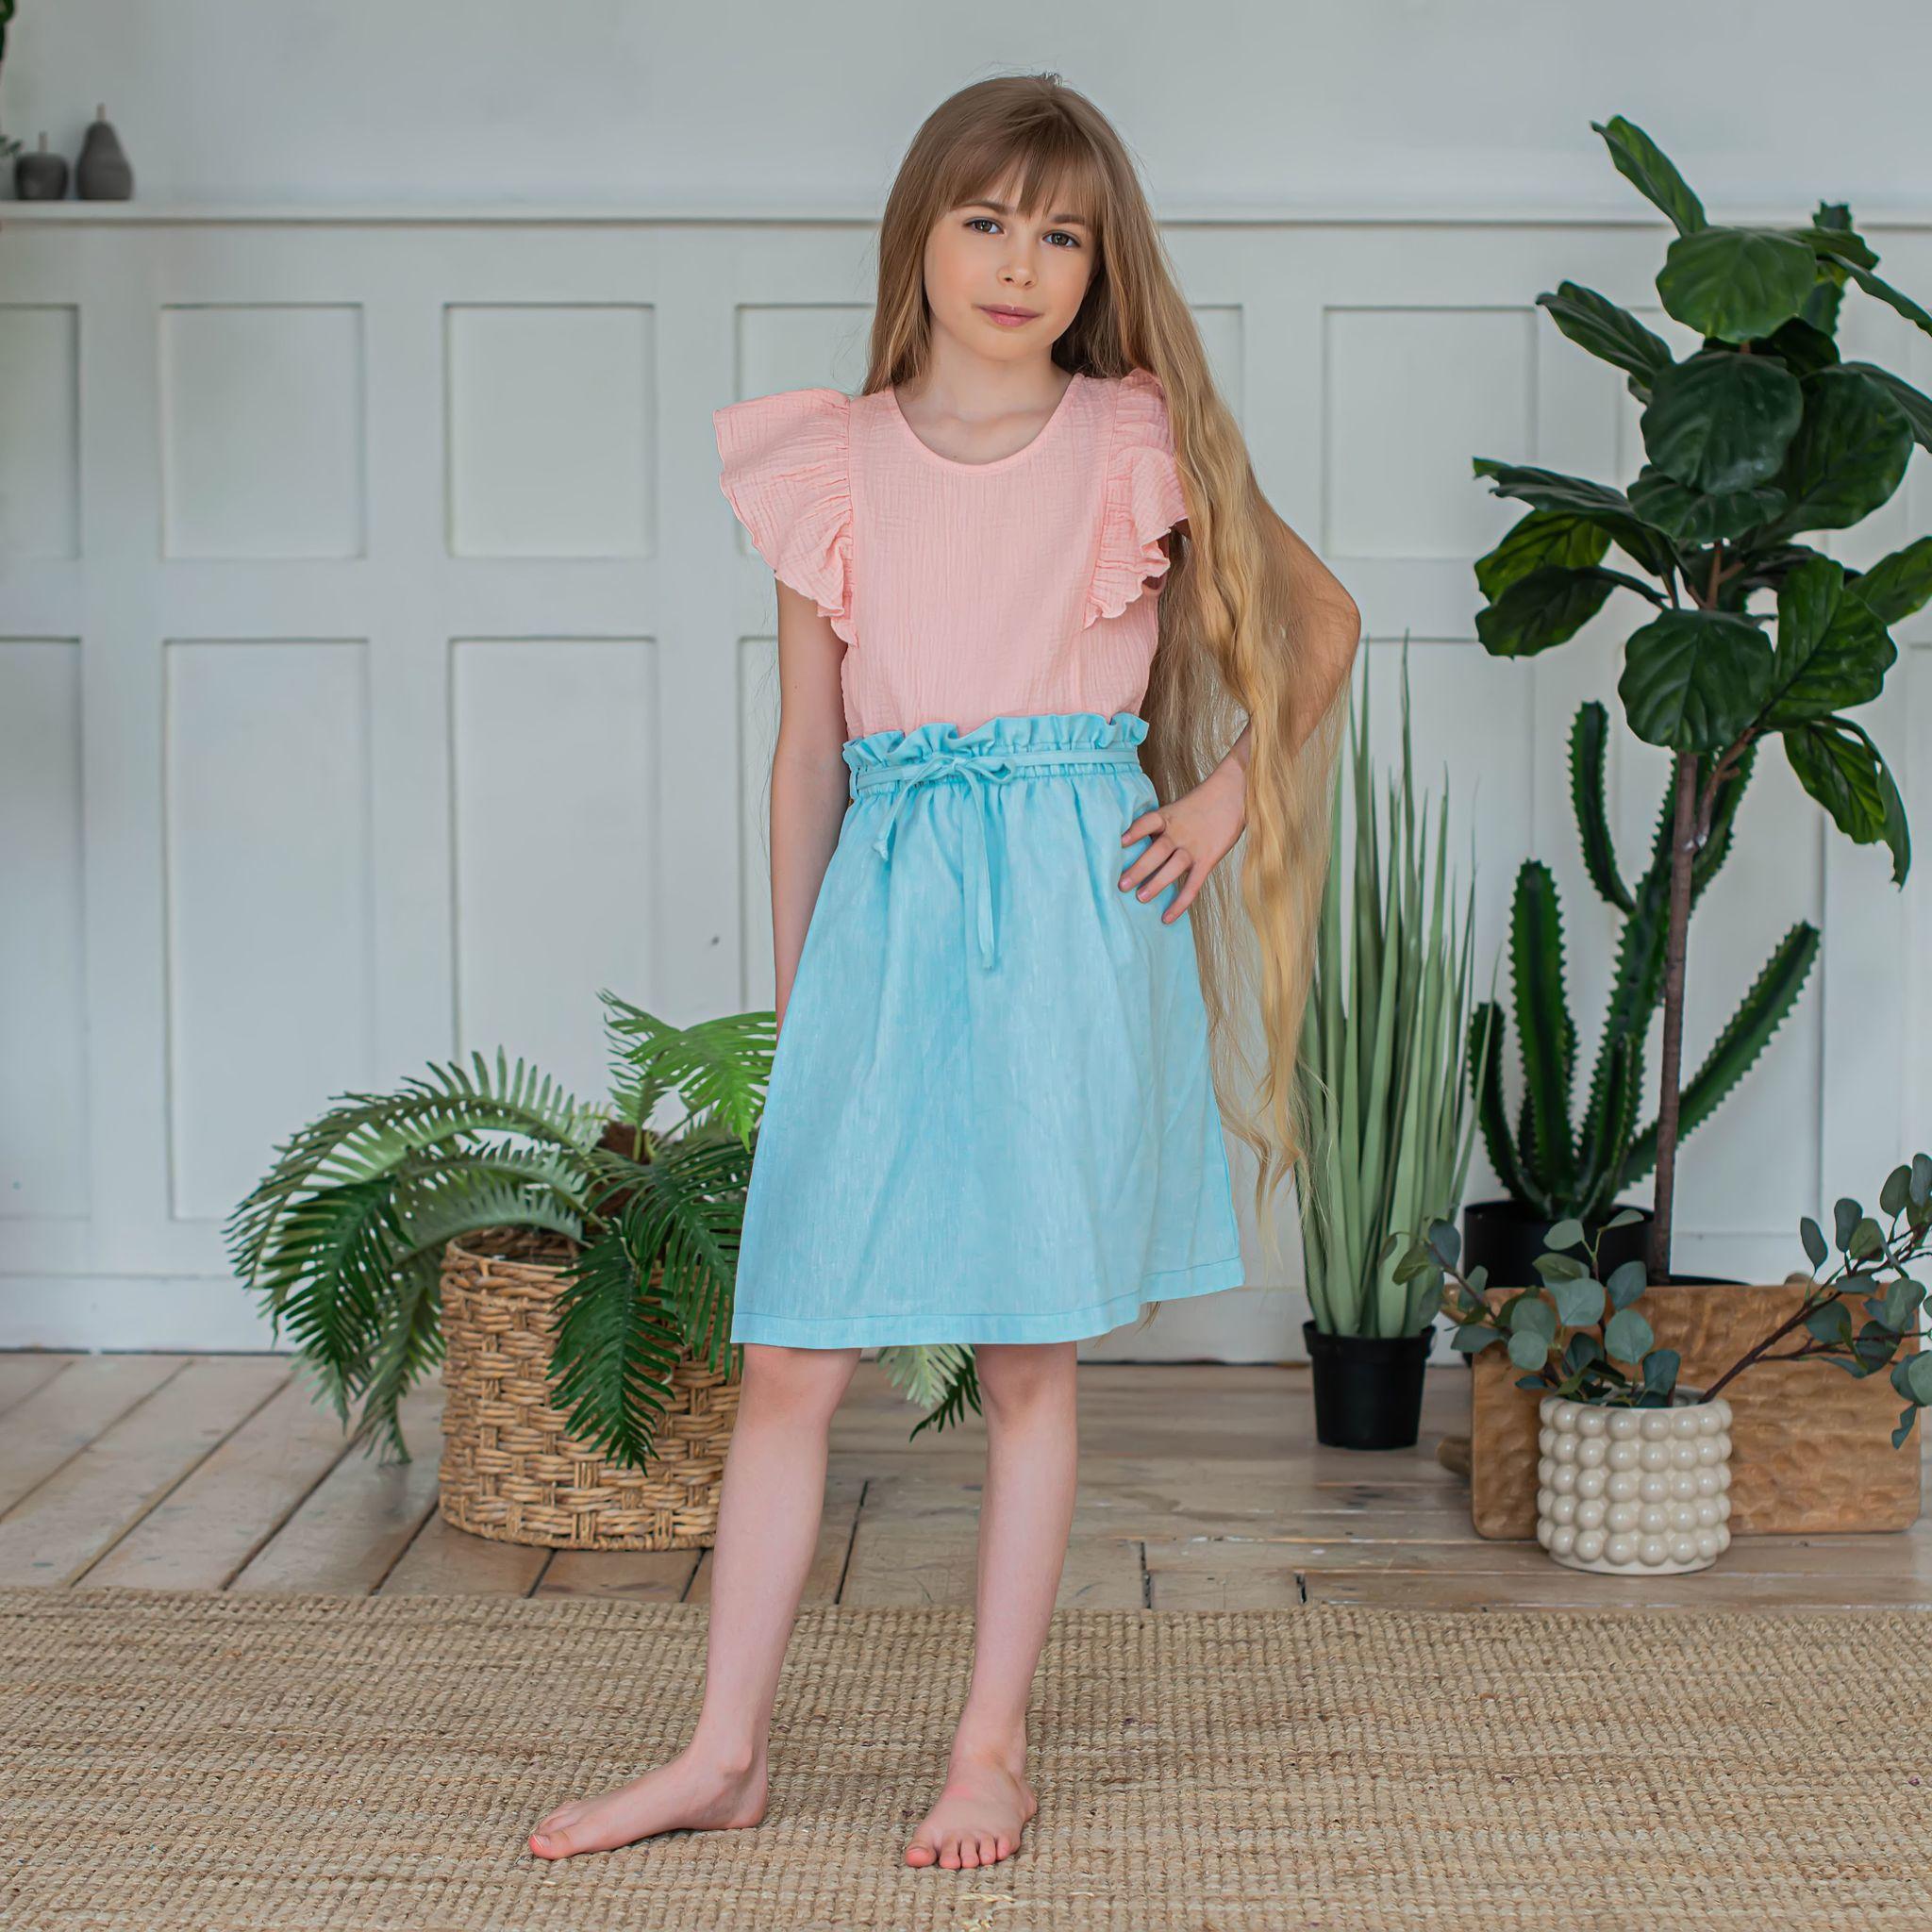 Cotton skirt for teens - Tiffany